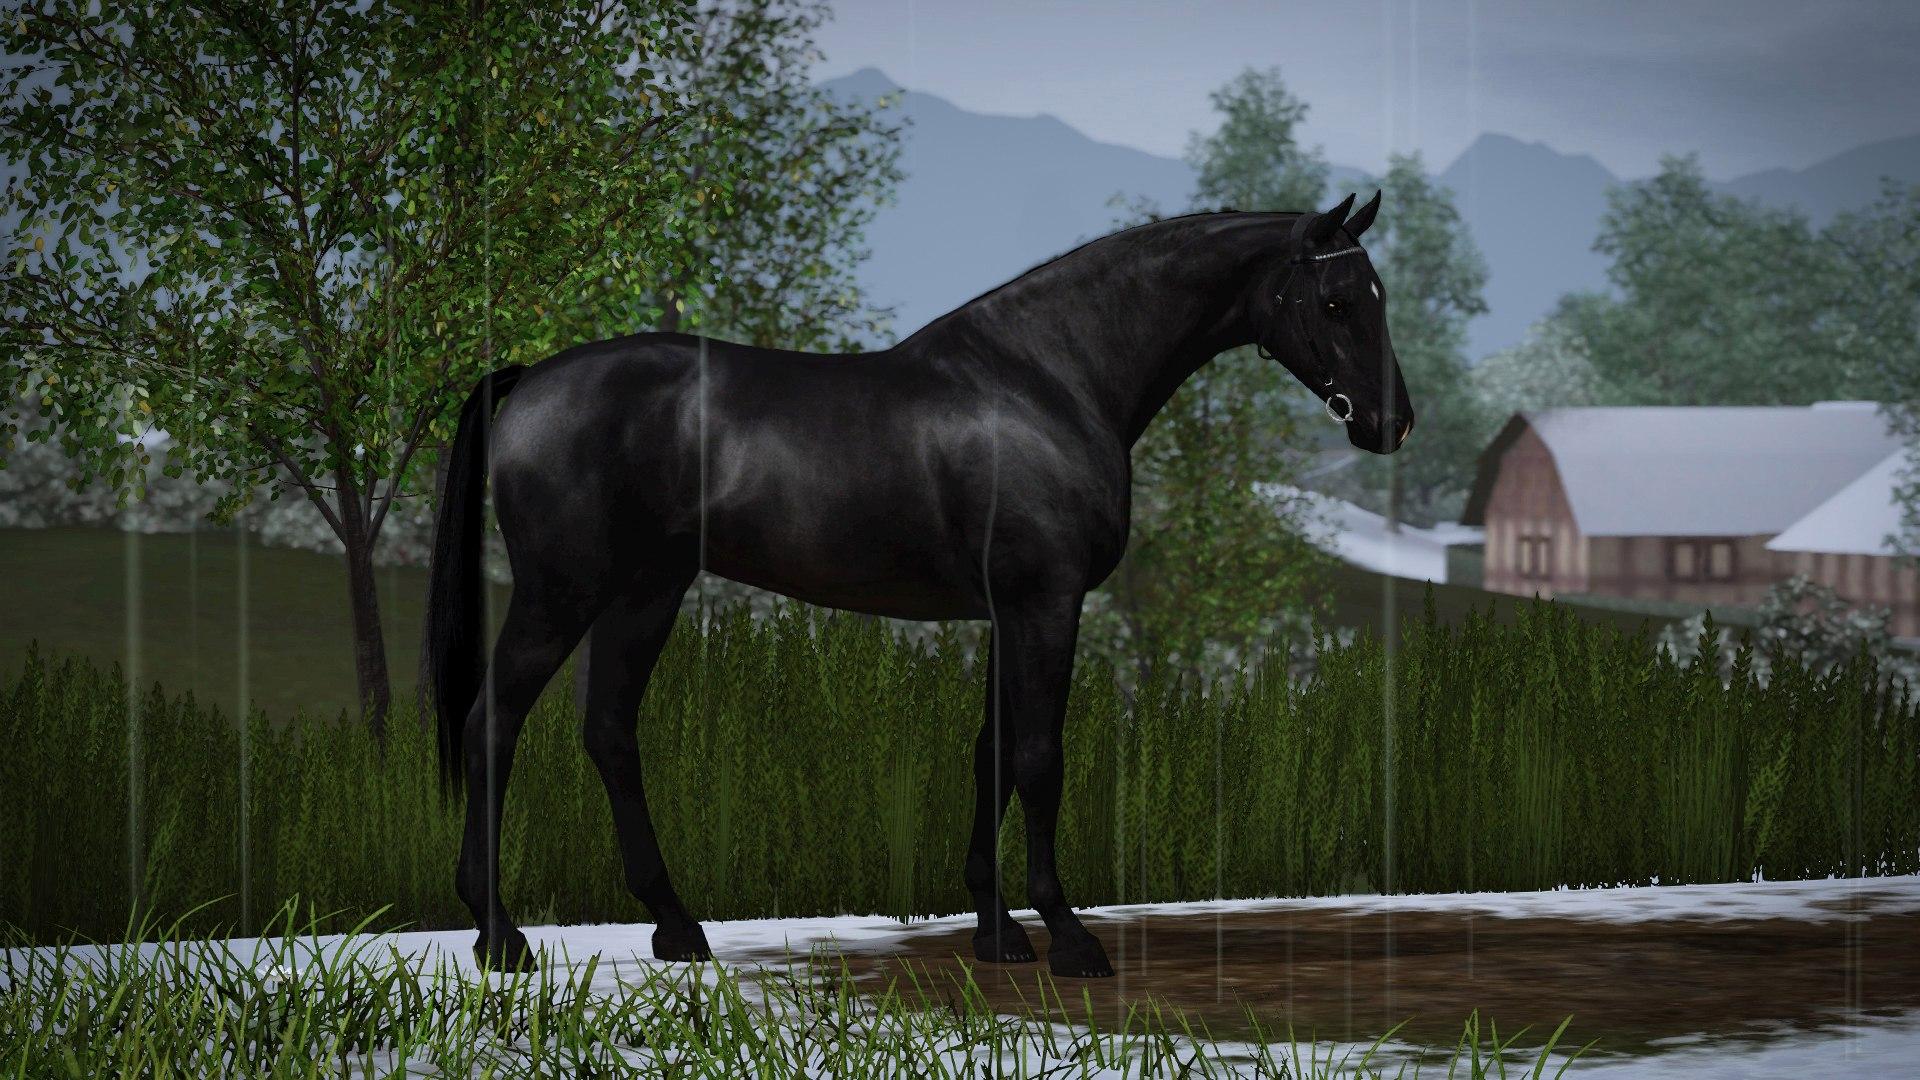 Регистрация лошадей в RHF 2 - Страница 5 GzYQn3shMGU